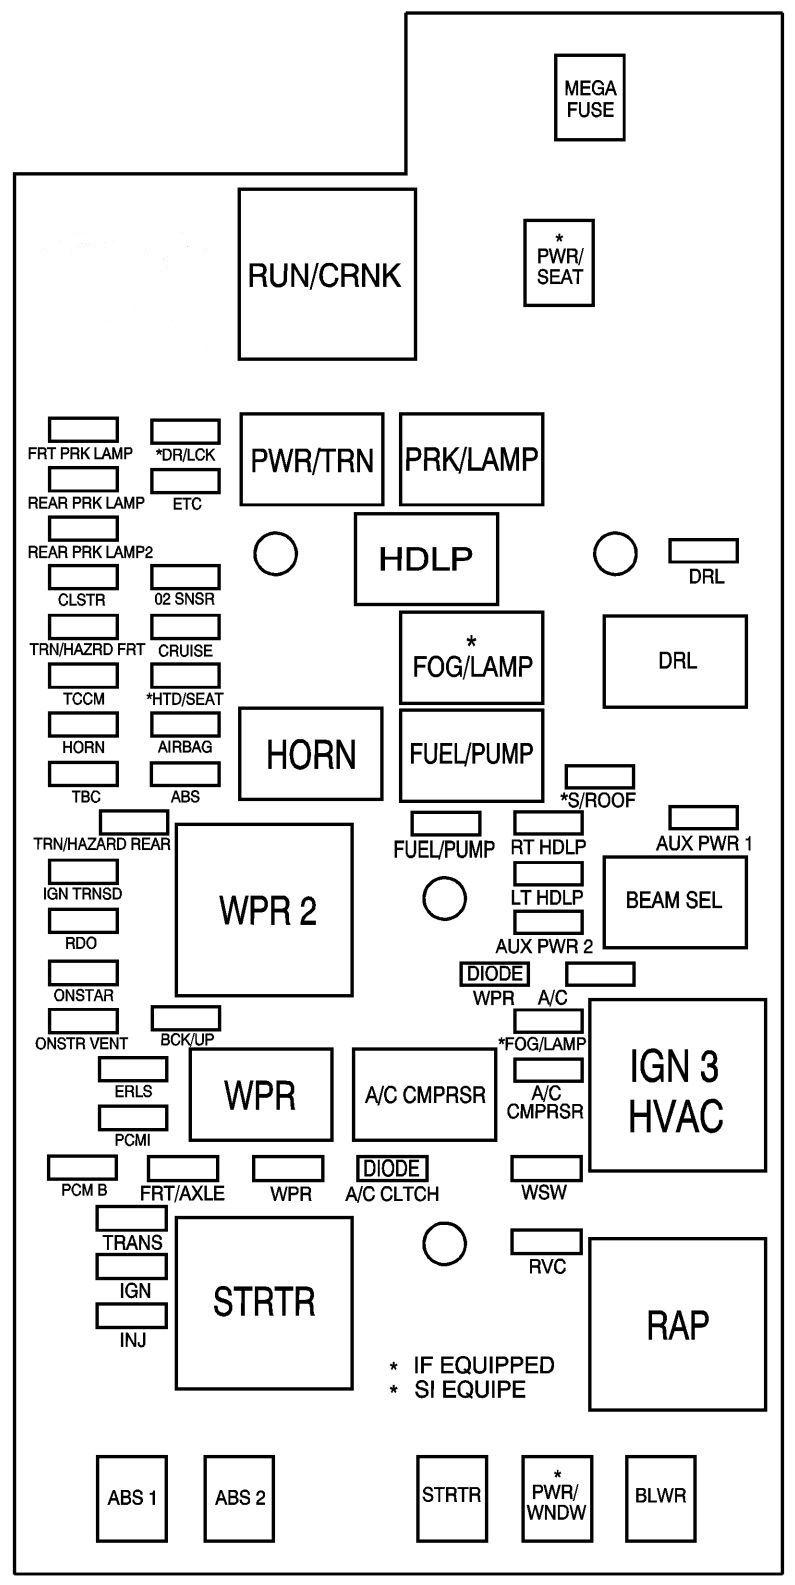 c9d0d48b8a44d30907c783b644b2ffcc outstanding wiring diagram for a 2004 gmc c5500 contemporary